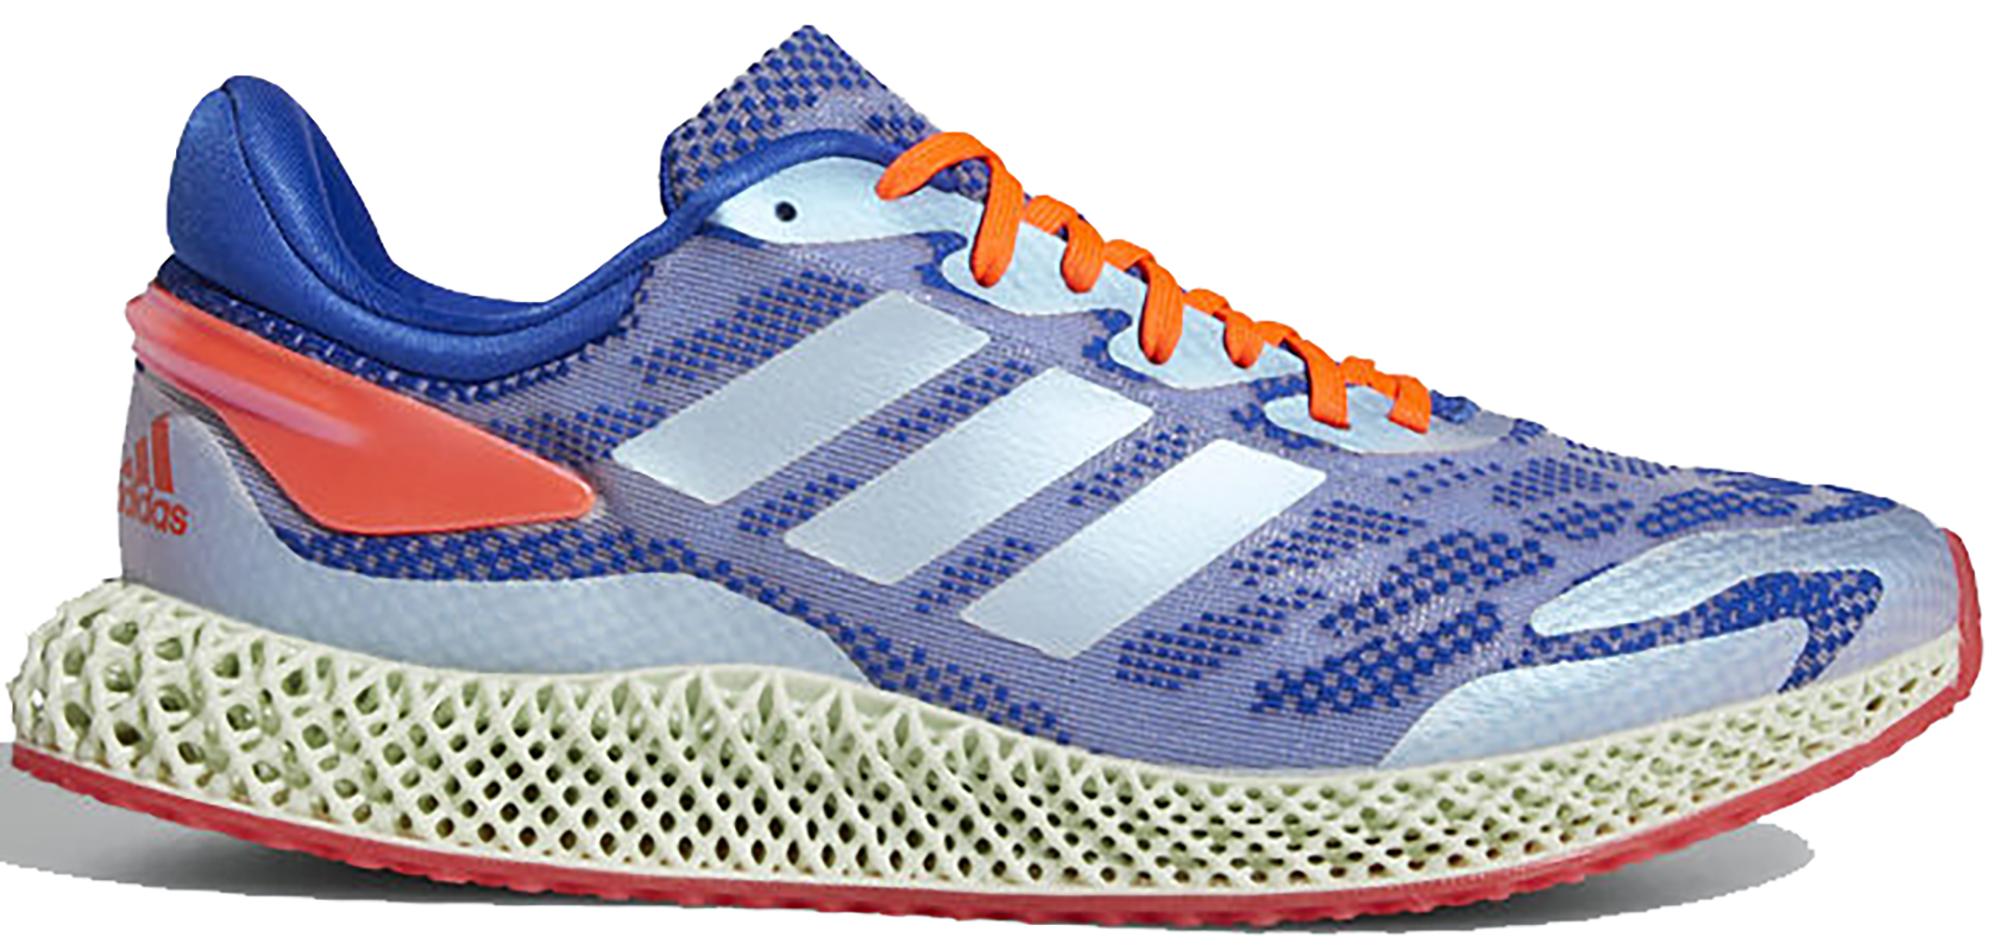 adidas 4D Run 1.0 Glory Blue Solar Red